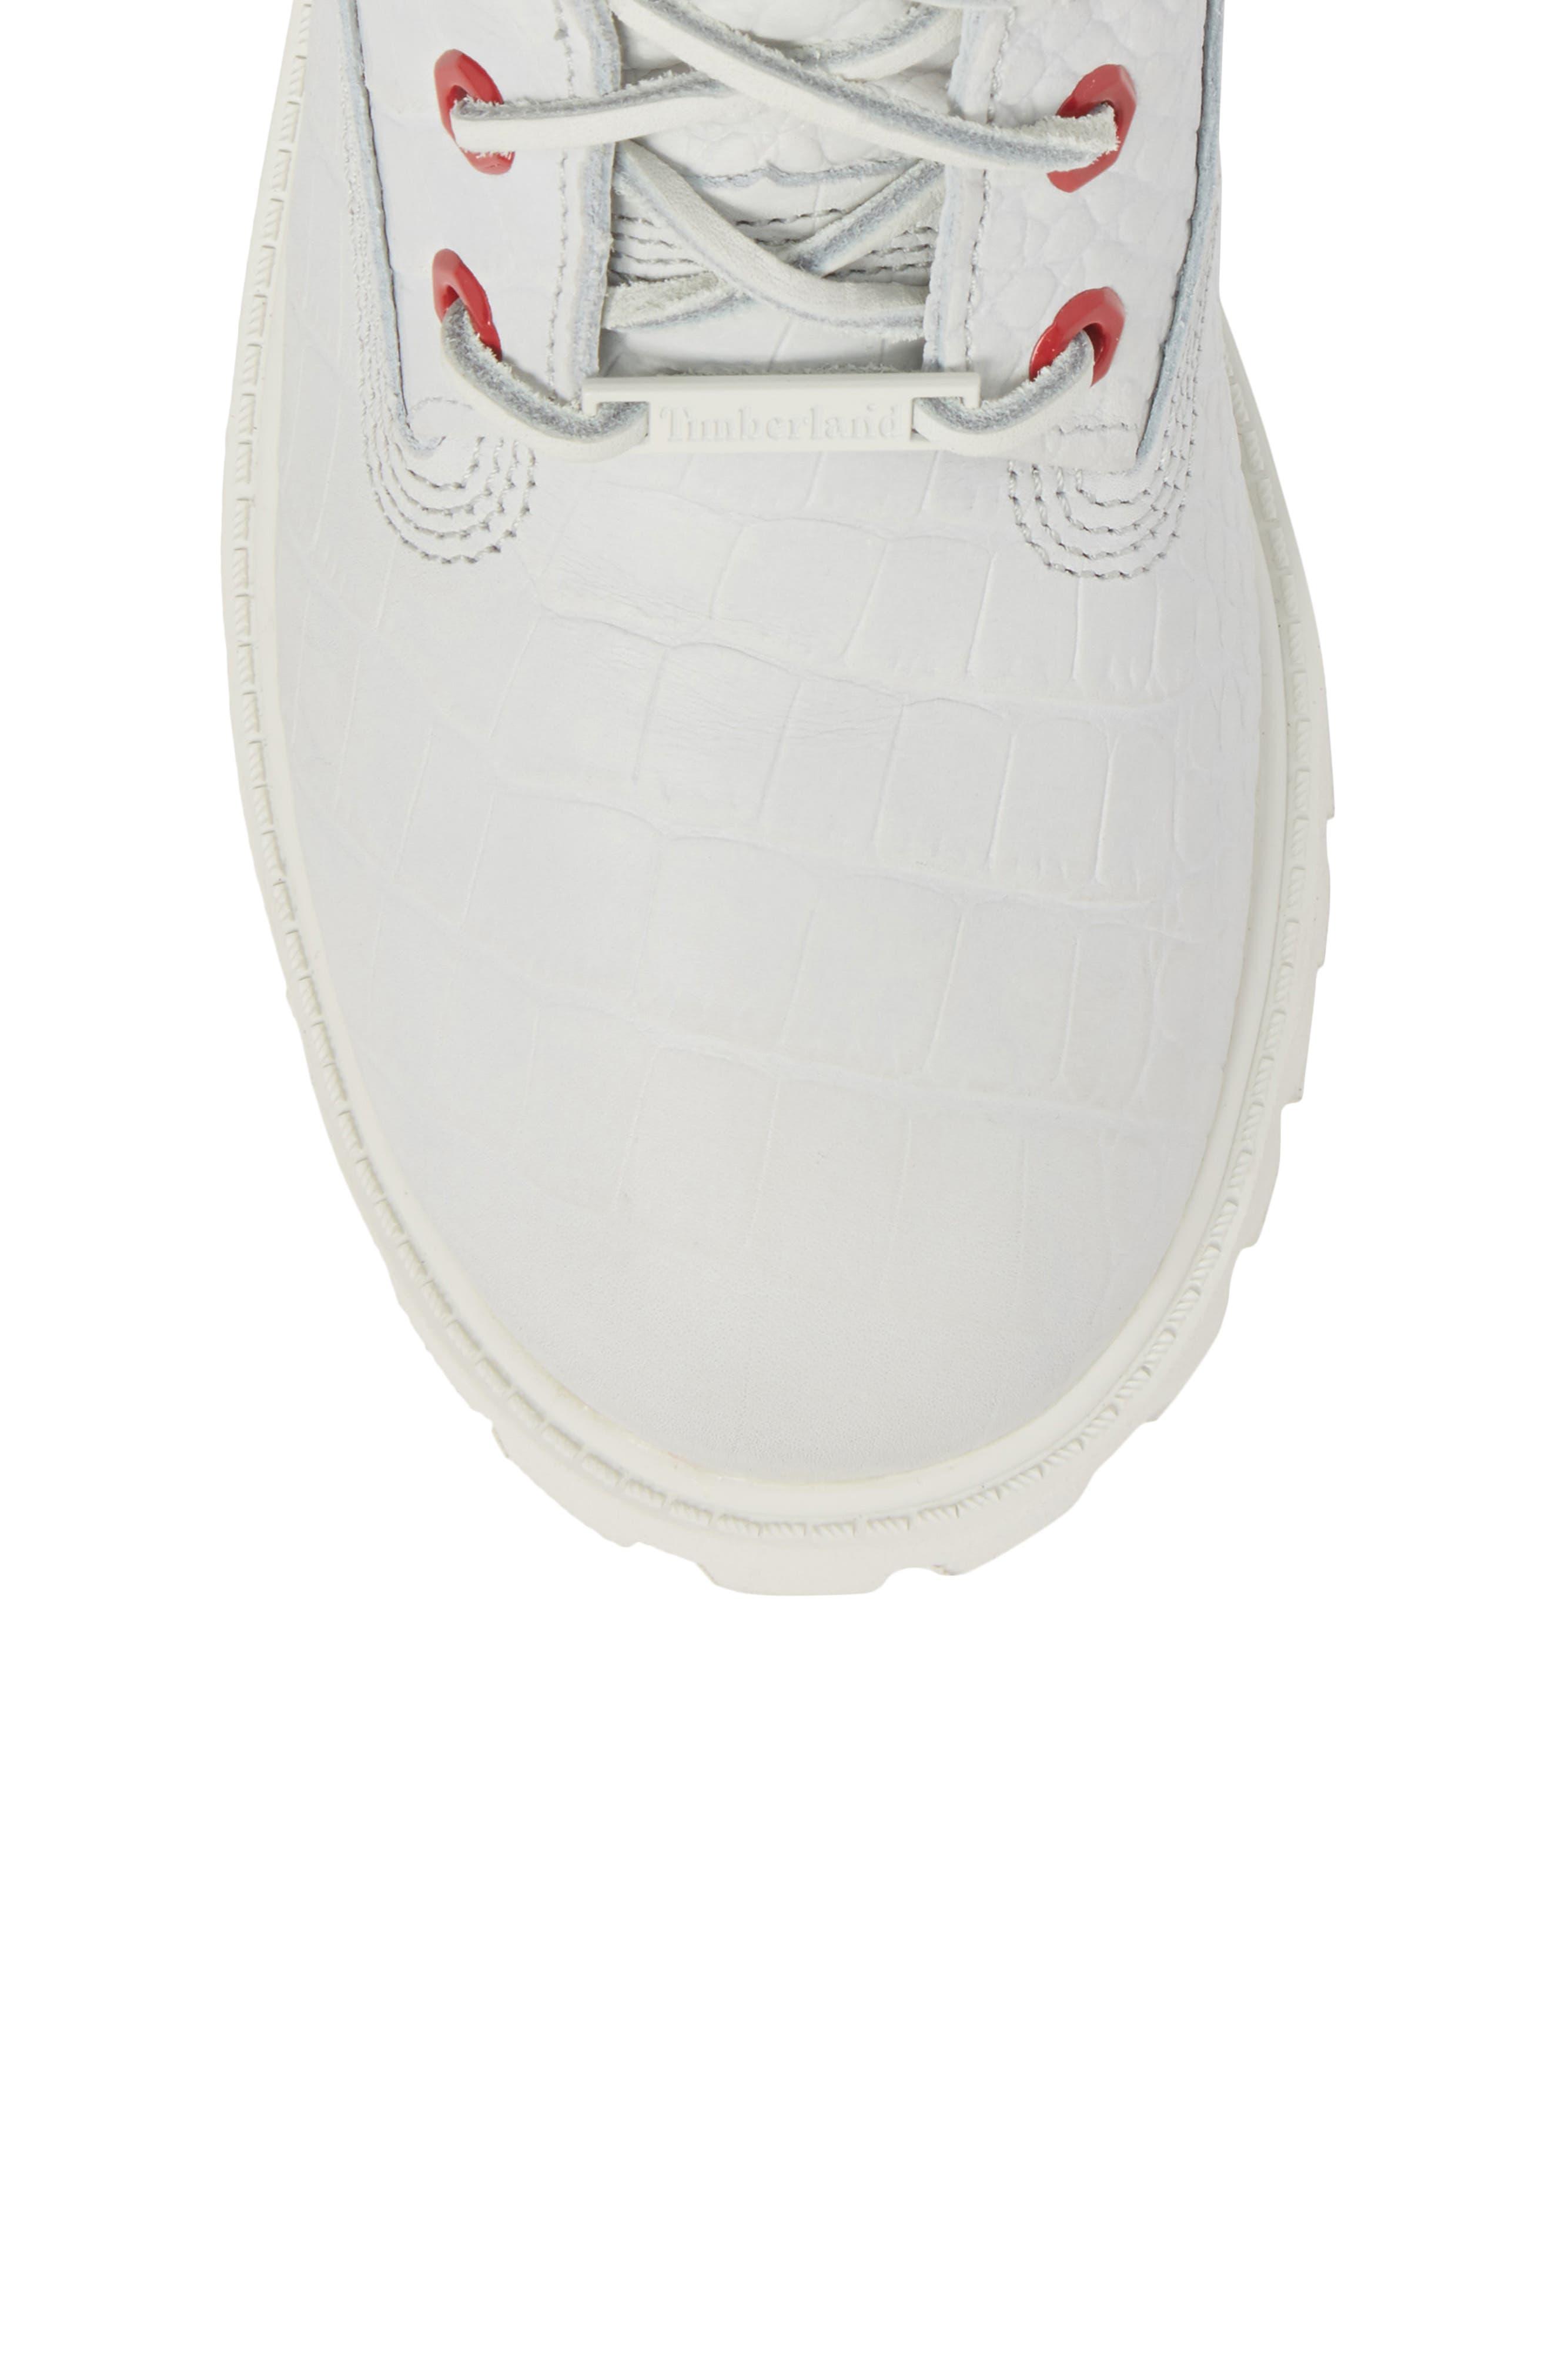 6-Inch Premium Waterproof Boot,                             Alternate thumbnail 5, color,                             White Cardinal Exotic